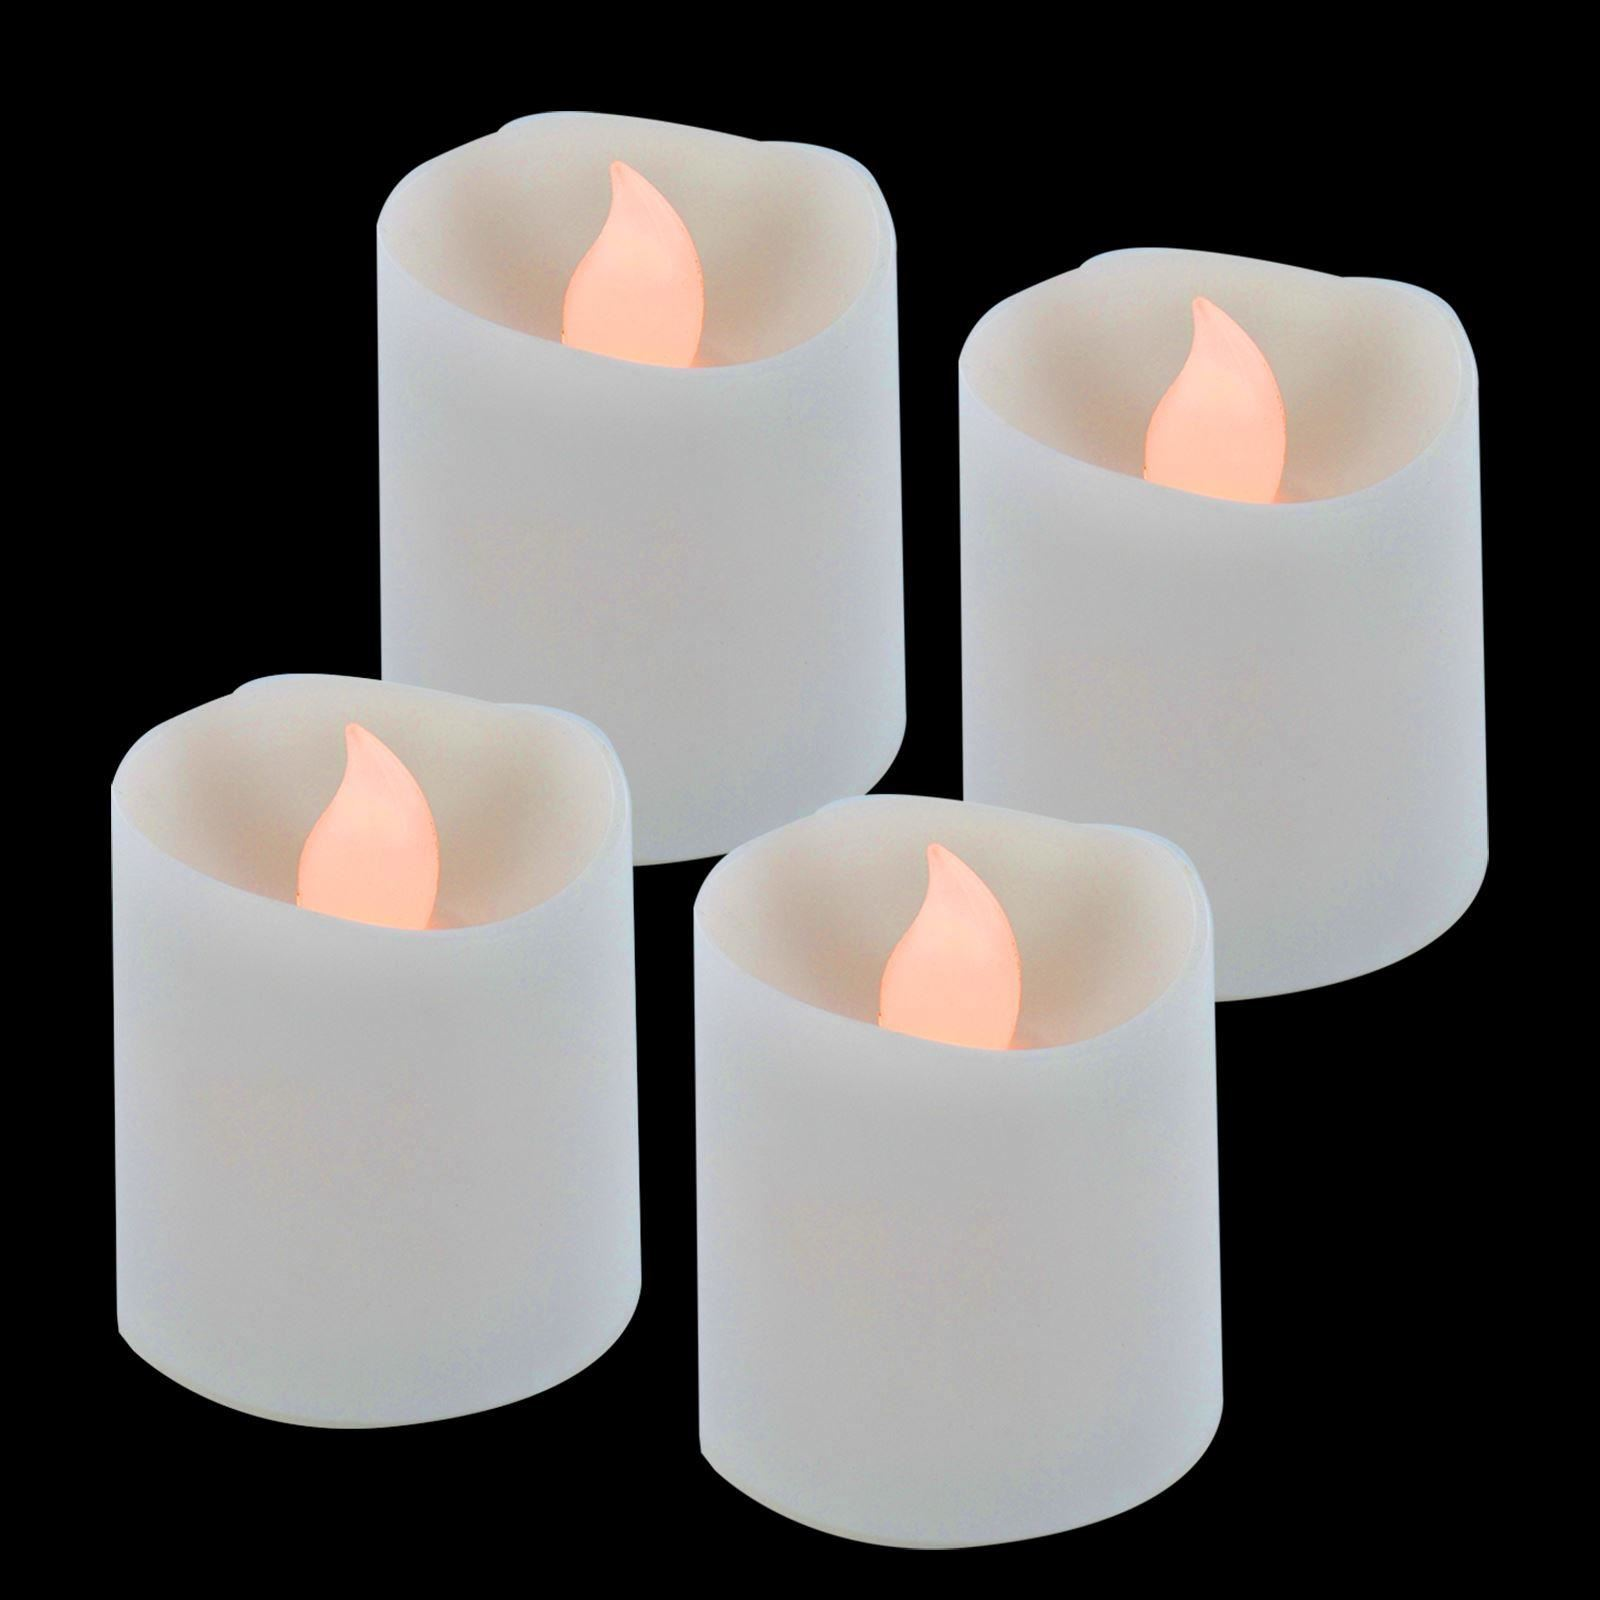 4-X-Led-Flameless-Candles-Parpadeante-bateria-Longlife-Velas-Decoracion